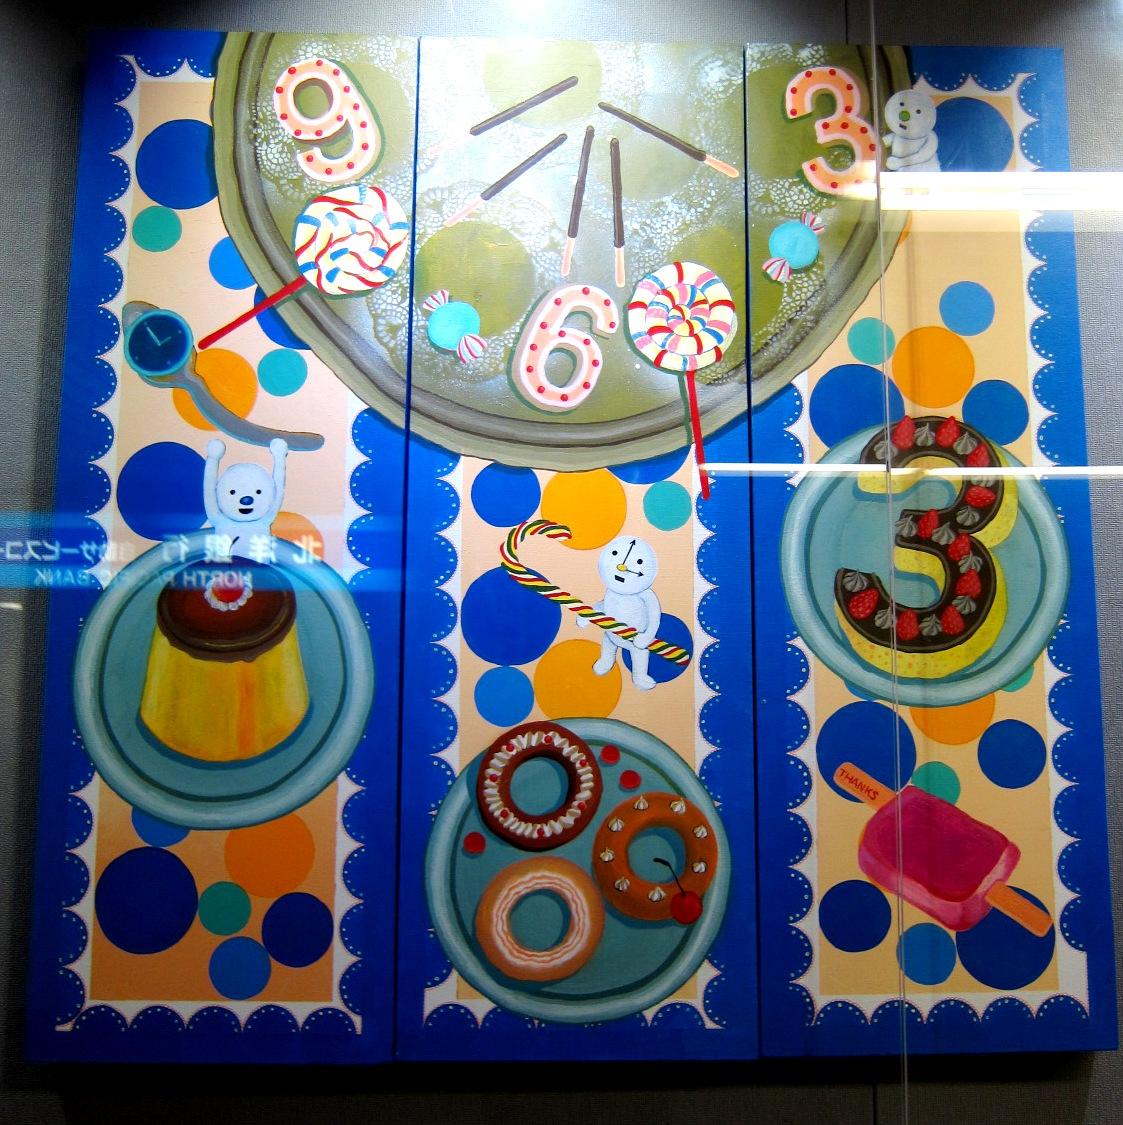 2216)「(YUKO個展)コトノハエマキinメトロギャラリ-」 円山公園駅メトロg. 9月4日(水)~9月26日(木) _f0126829_09865.jpg